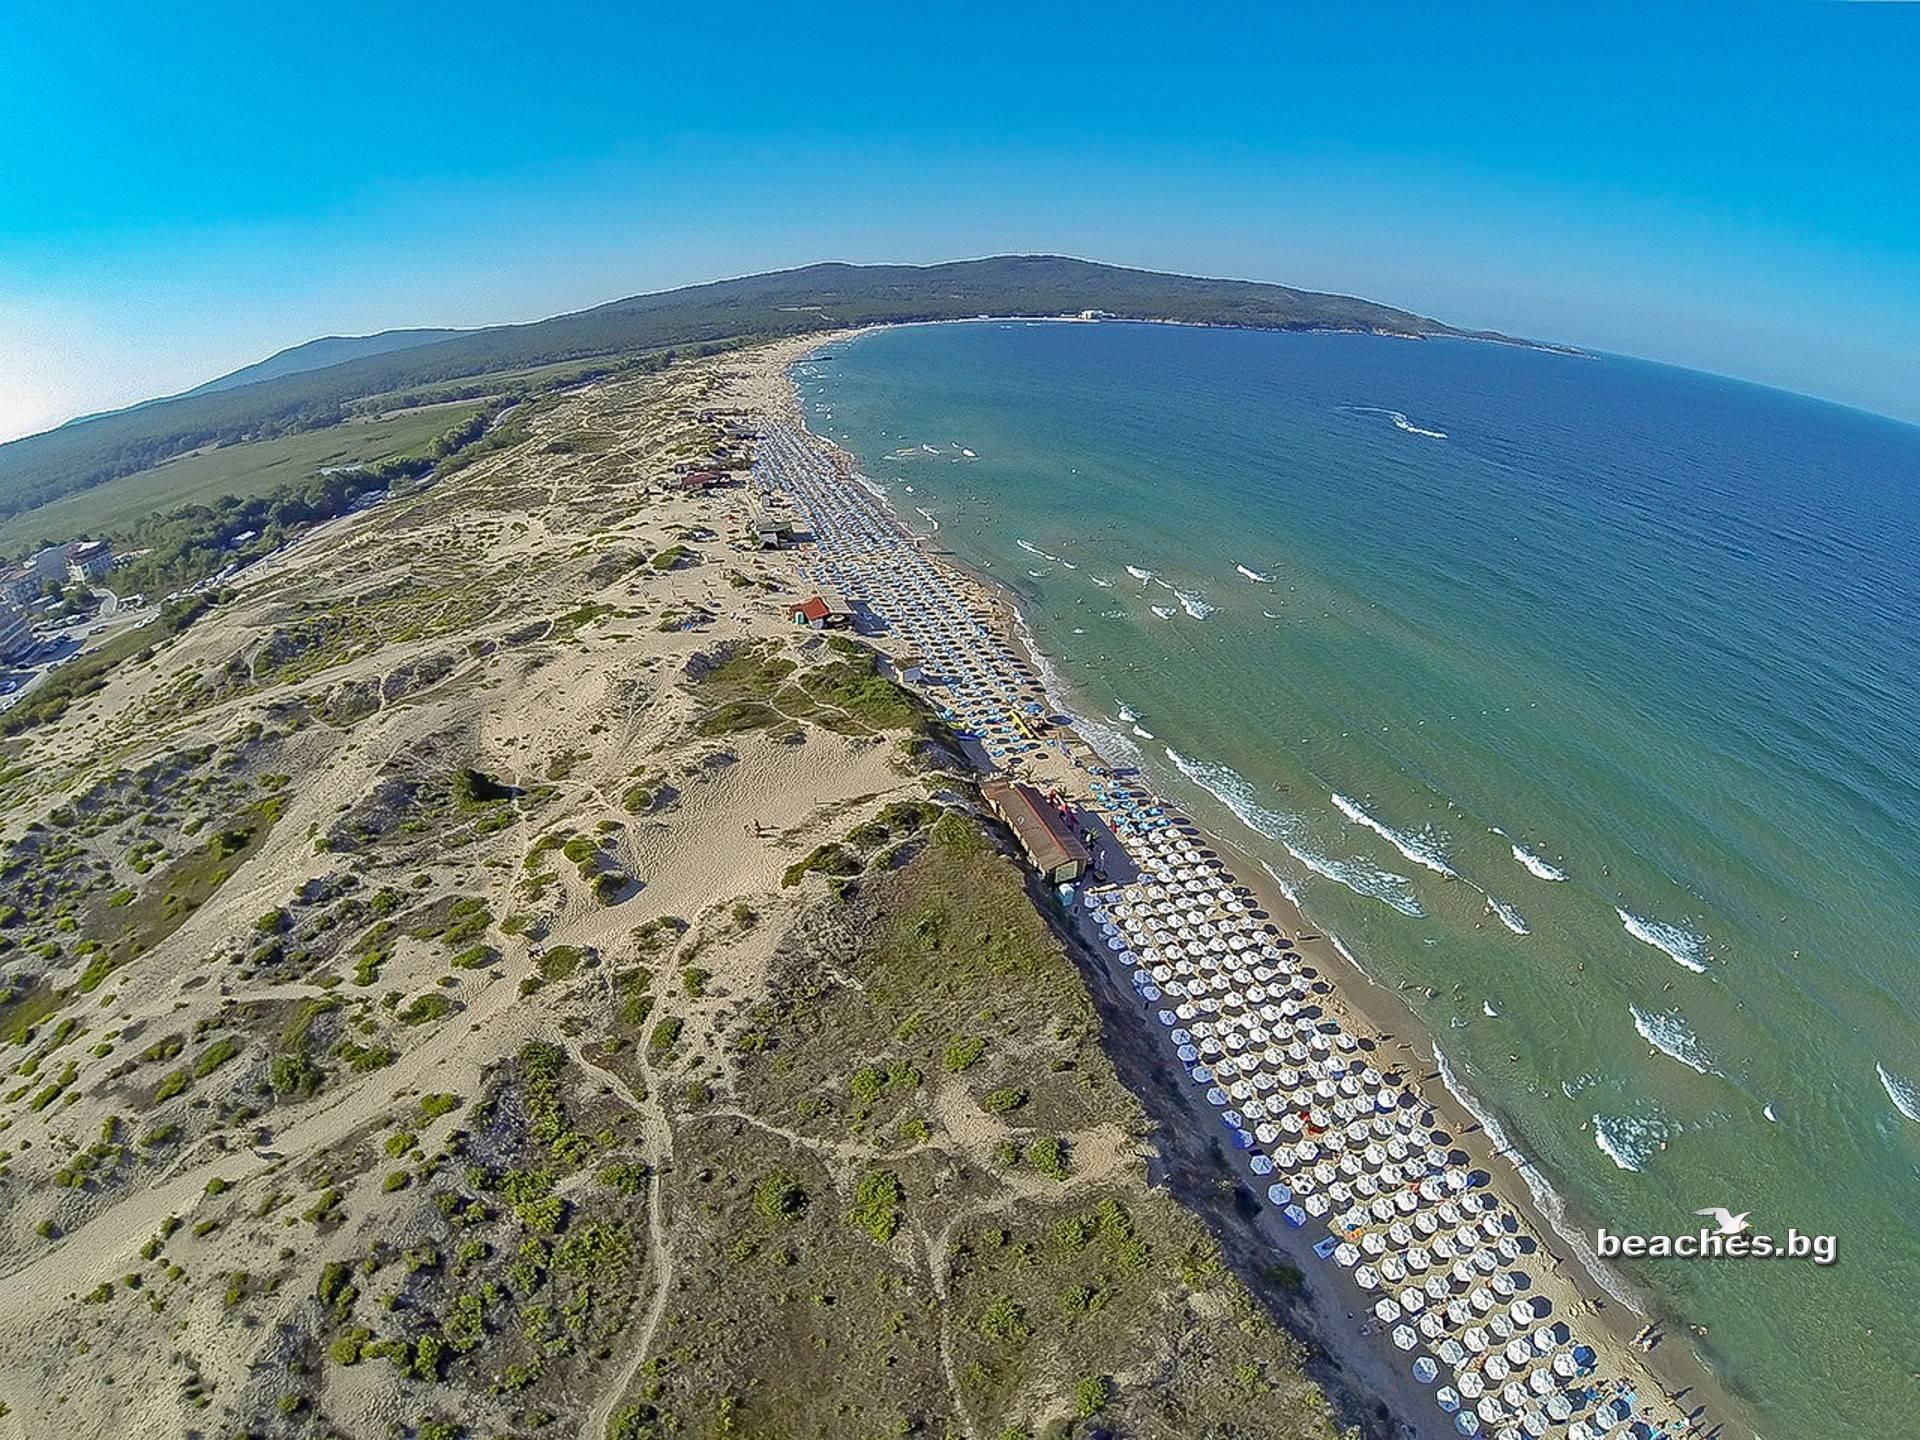 beaches.bg - Северен Плаж Приморско, България/ Primorsko North beach, Bulgaria